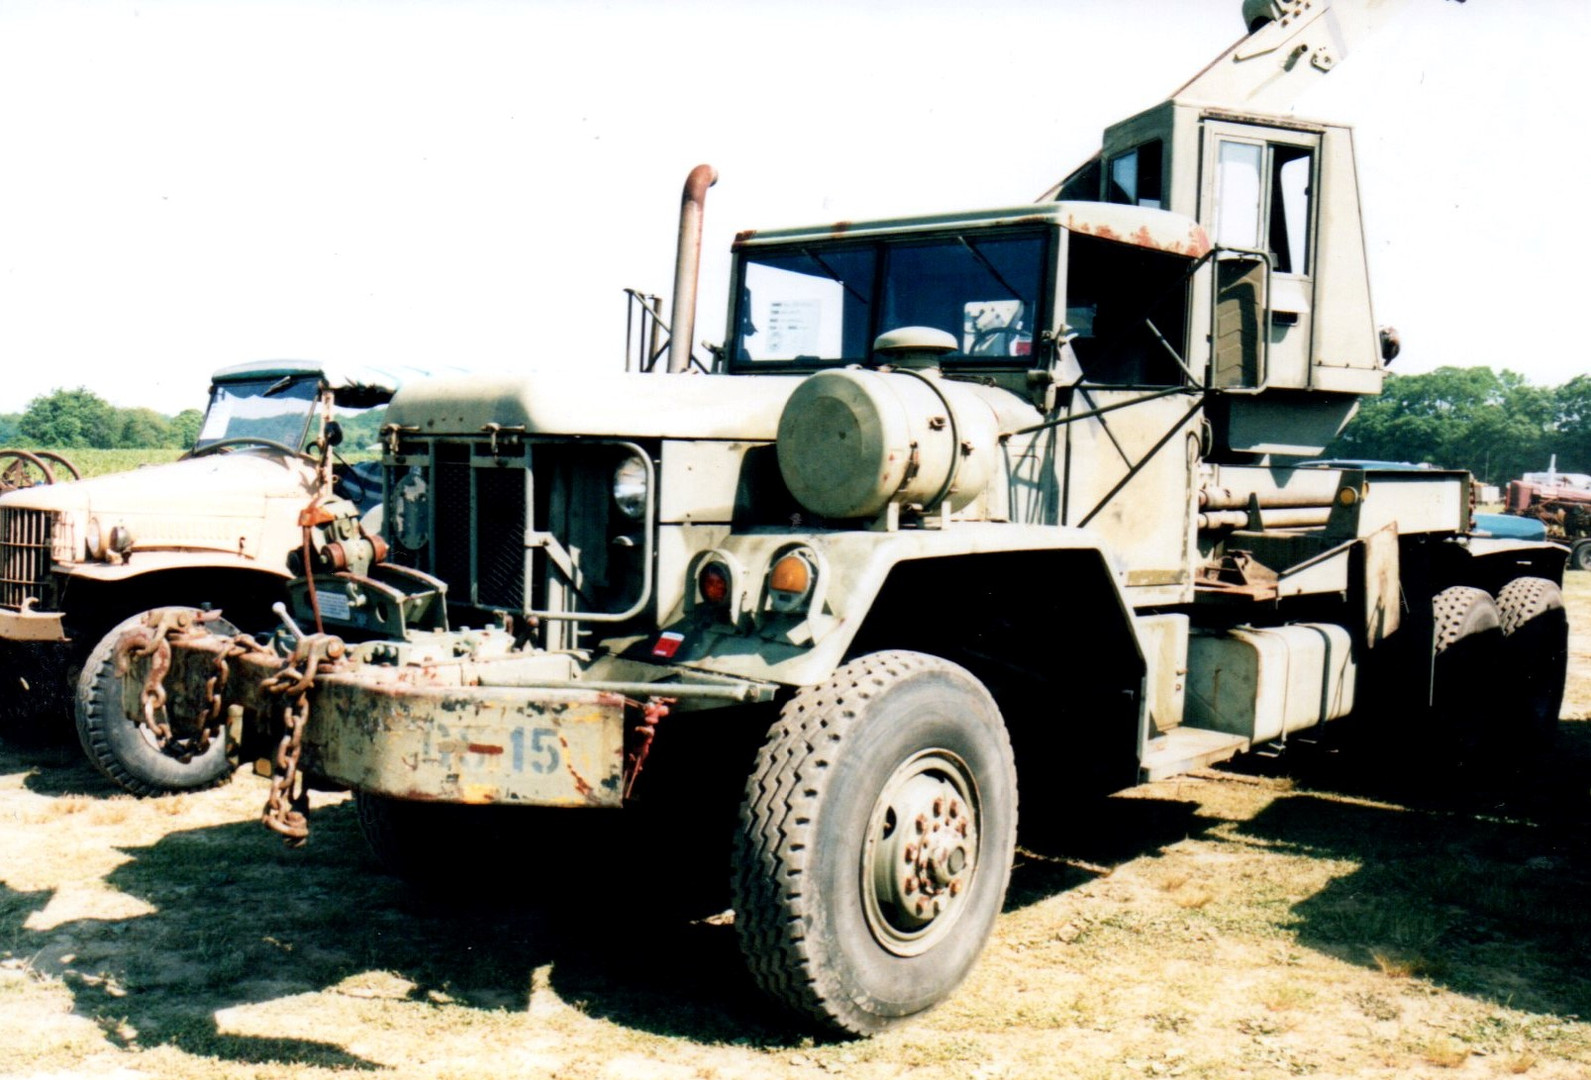 1971 AM General M819 tractor-wrecker - Robert Viscardi